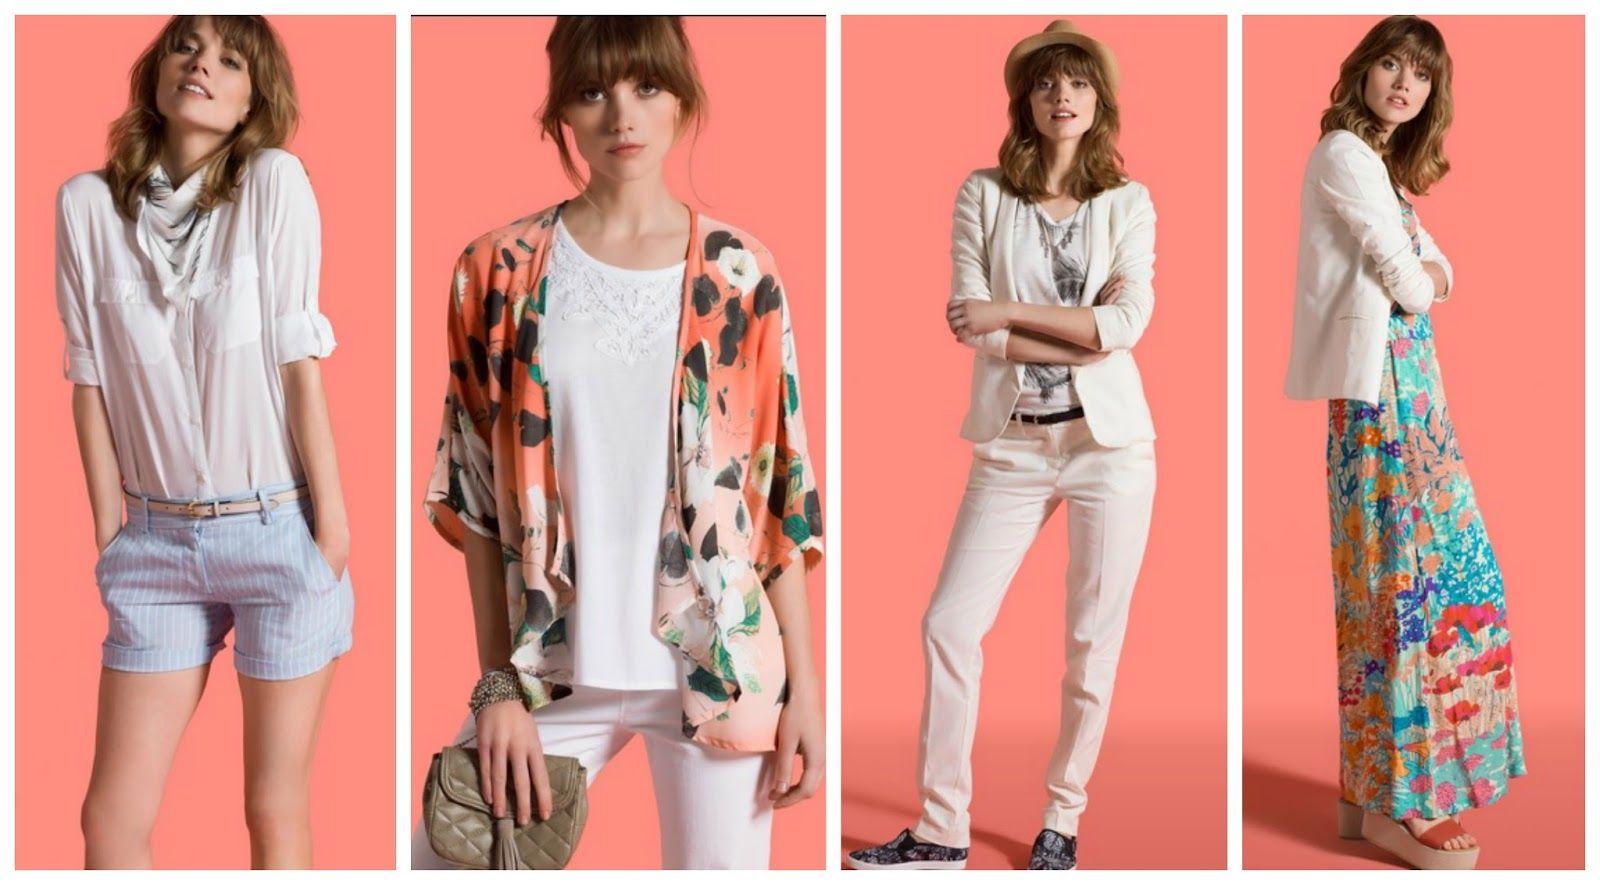 Image gallery moda 2015 zara - Catalogo de zara primavera verano 2015 ...